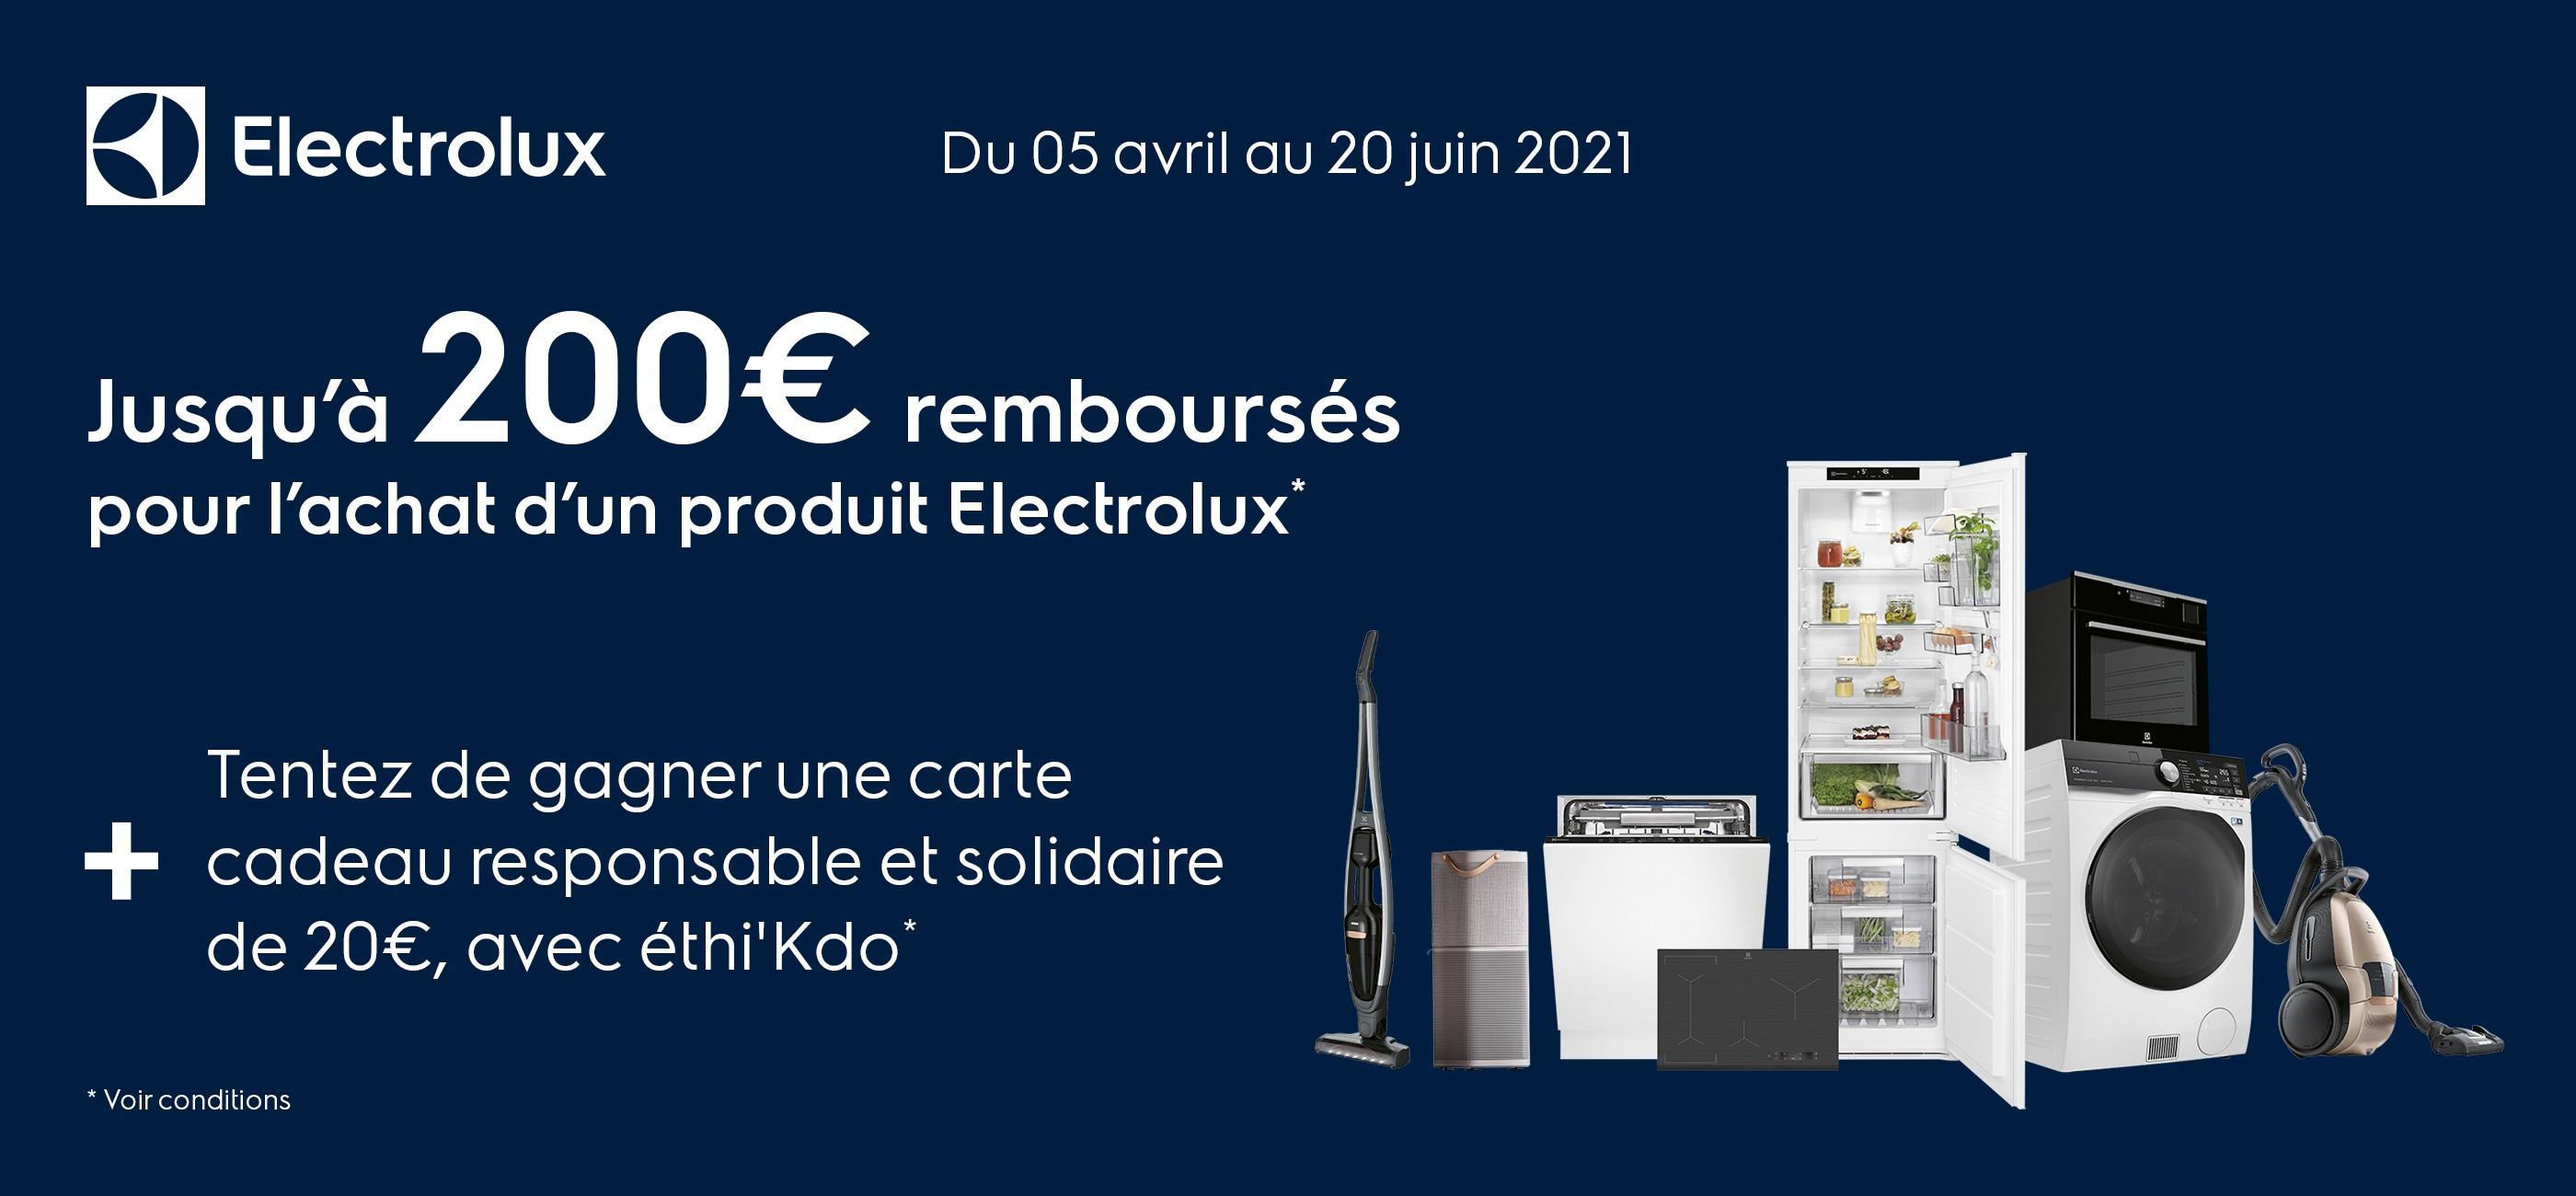 ELECTROLUX 200 € AVRIL